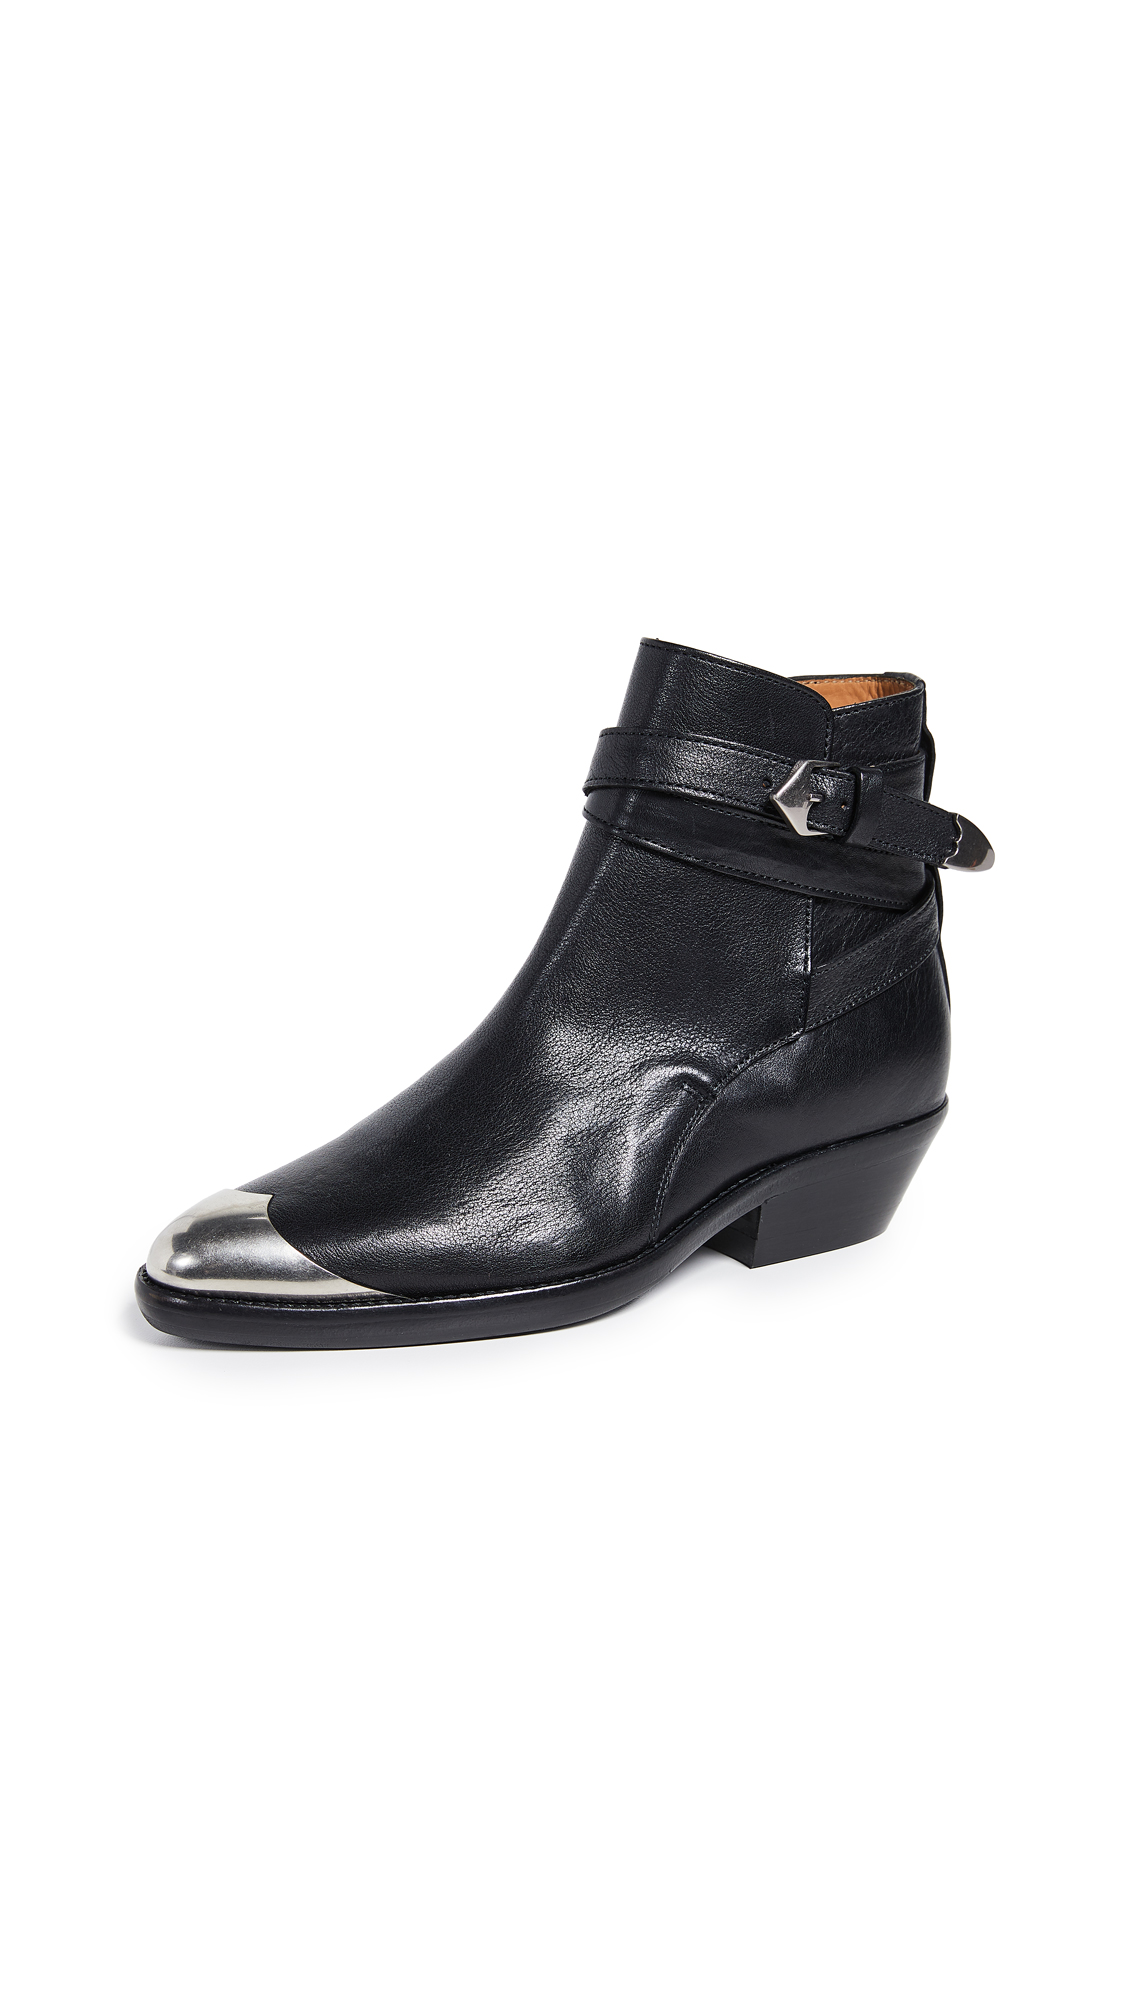 Isabel Marant Donee Boots - Black